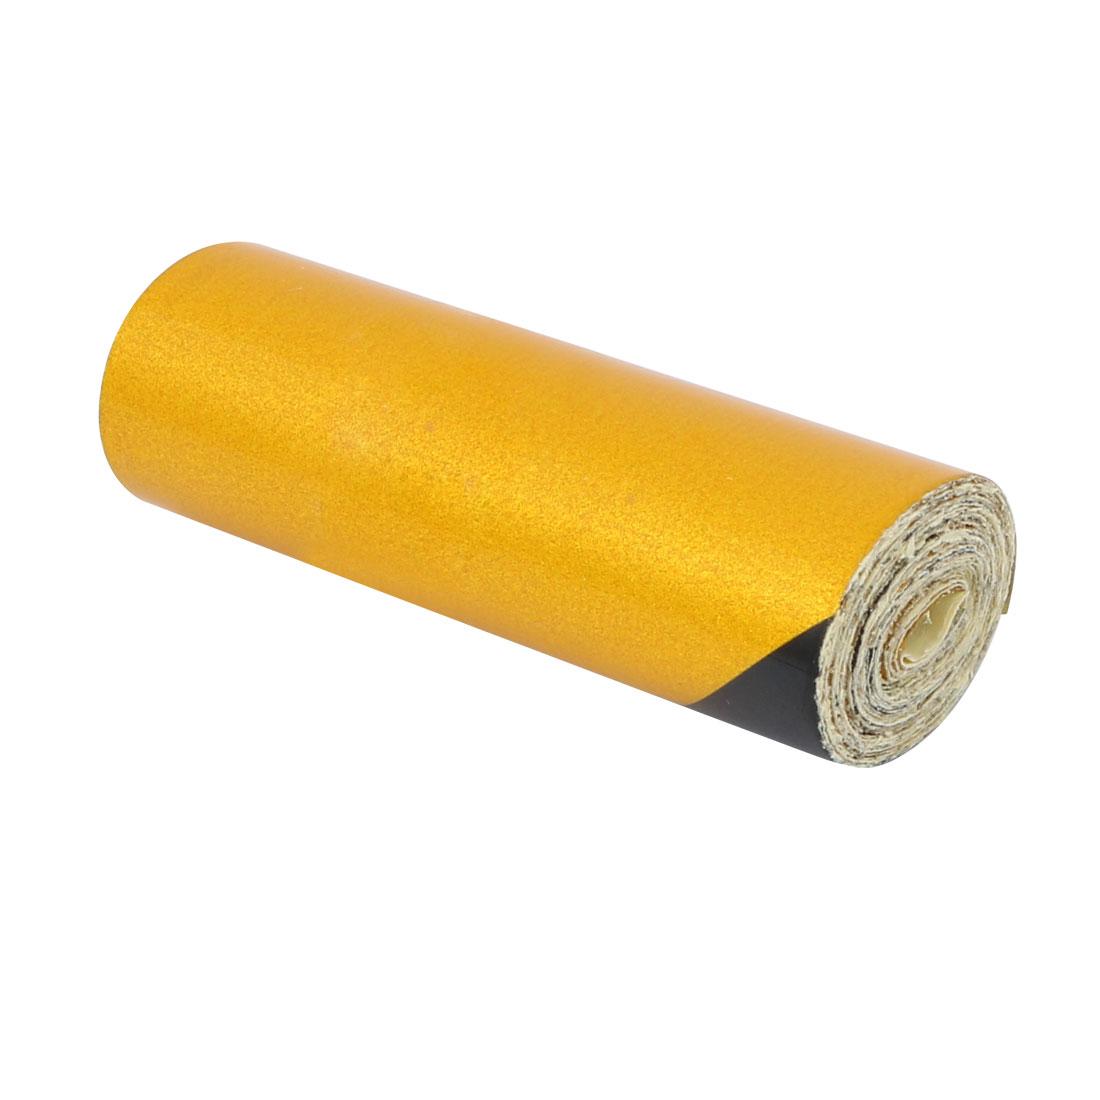 5cm Wide 1M Long Single Sided Adhesive Reflective Warning Tape Yellow Black